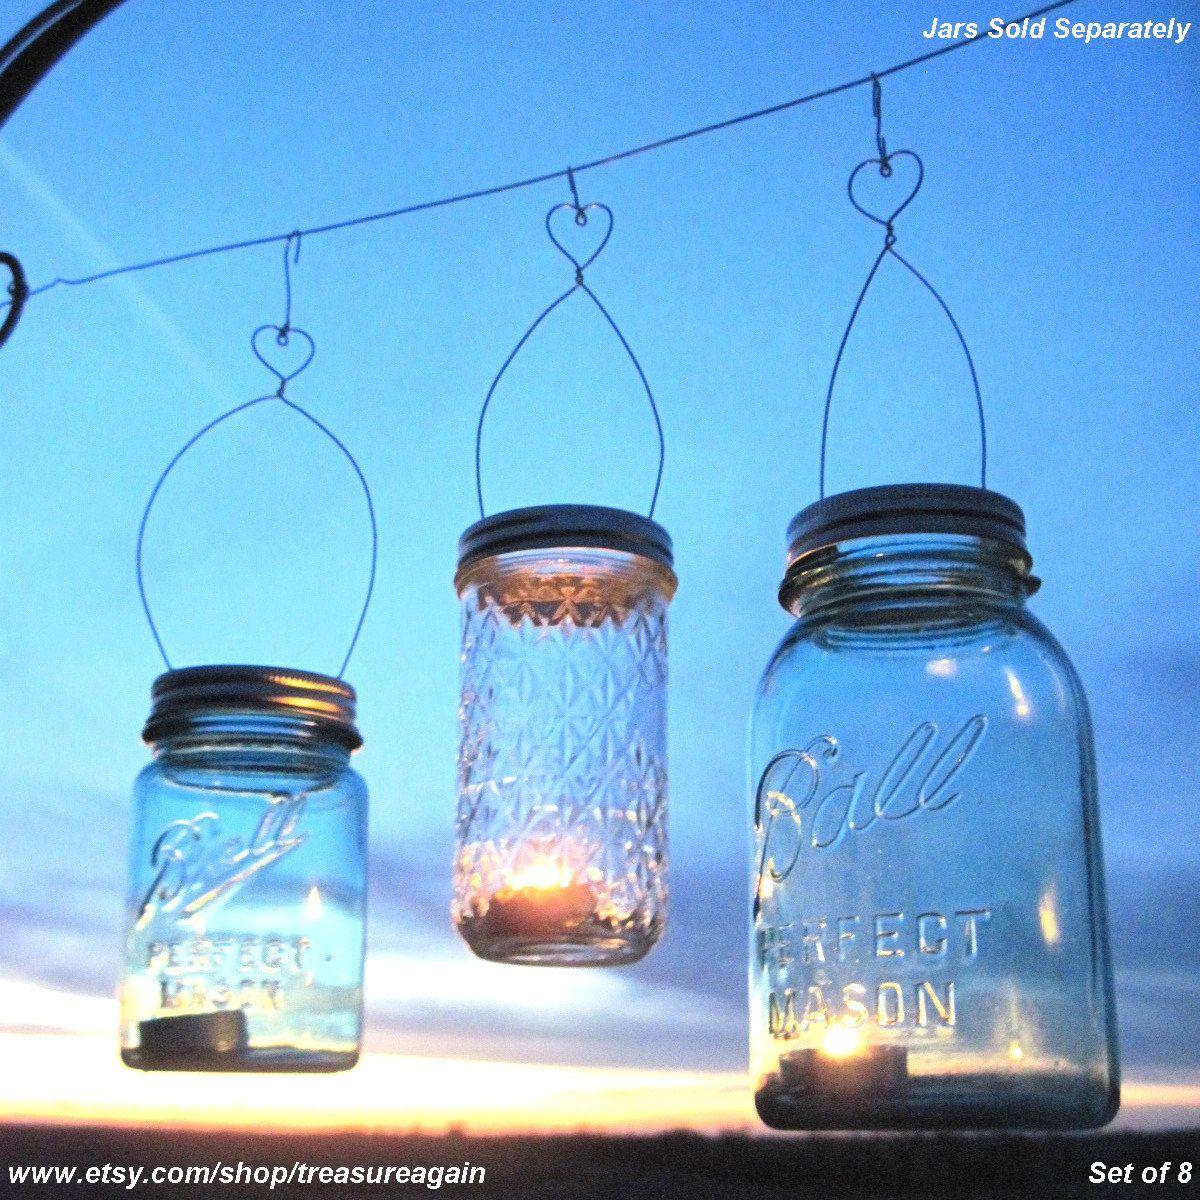 8 DIY Love-You-Lantern Jar Hangers, Heart Mason Jar Wedding Hanging ...